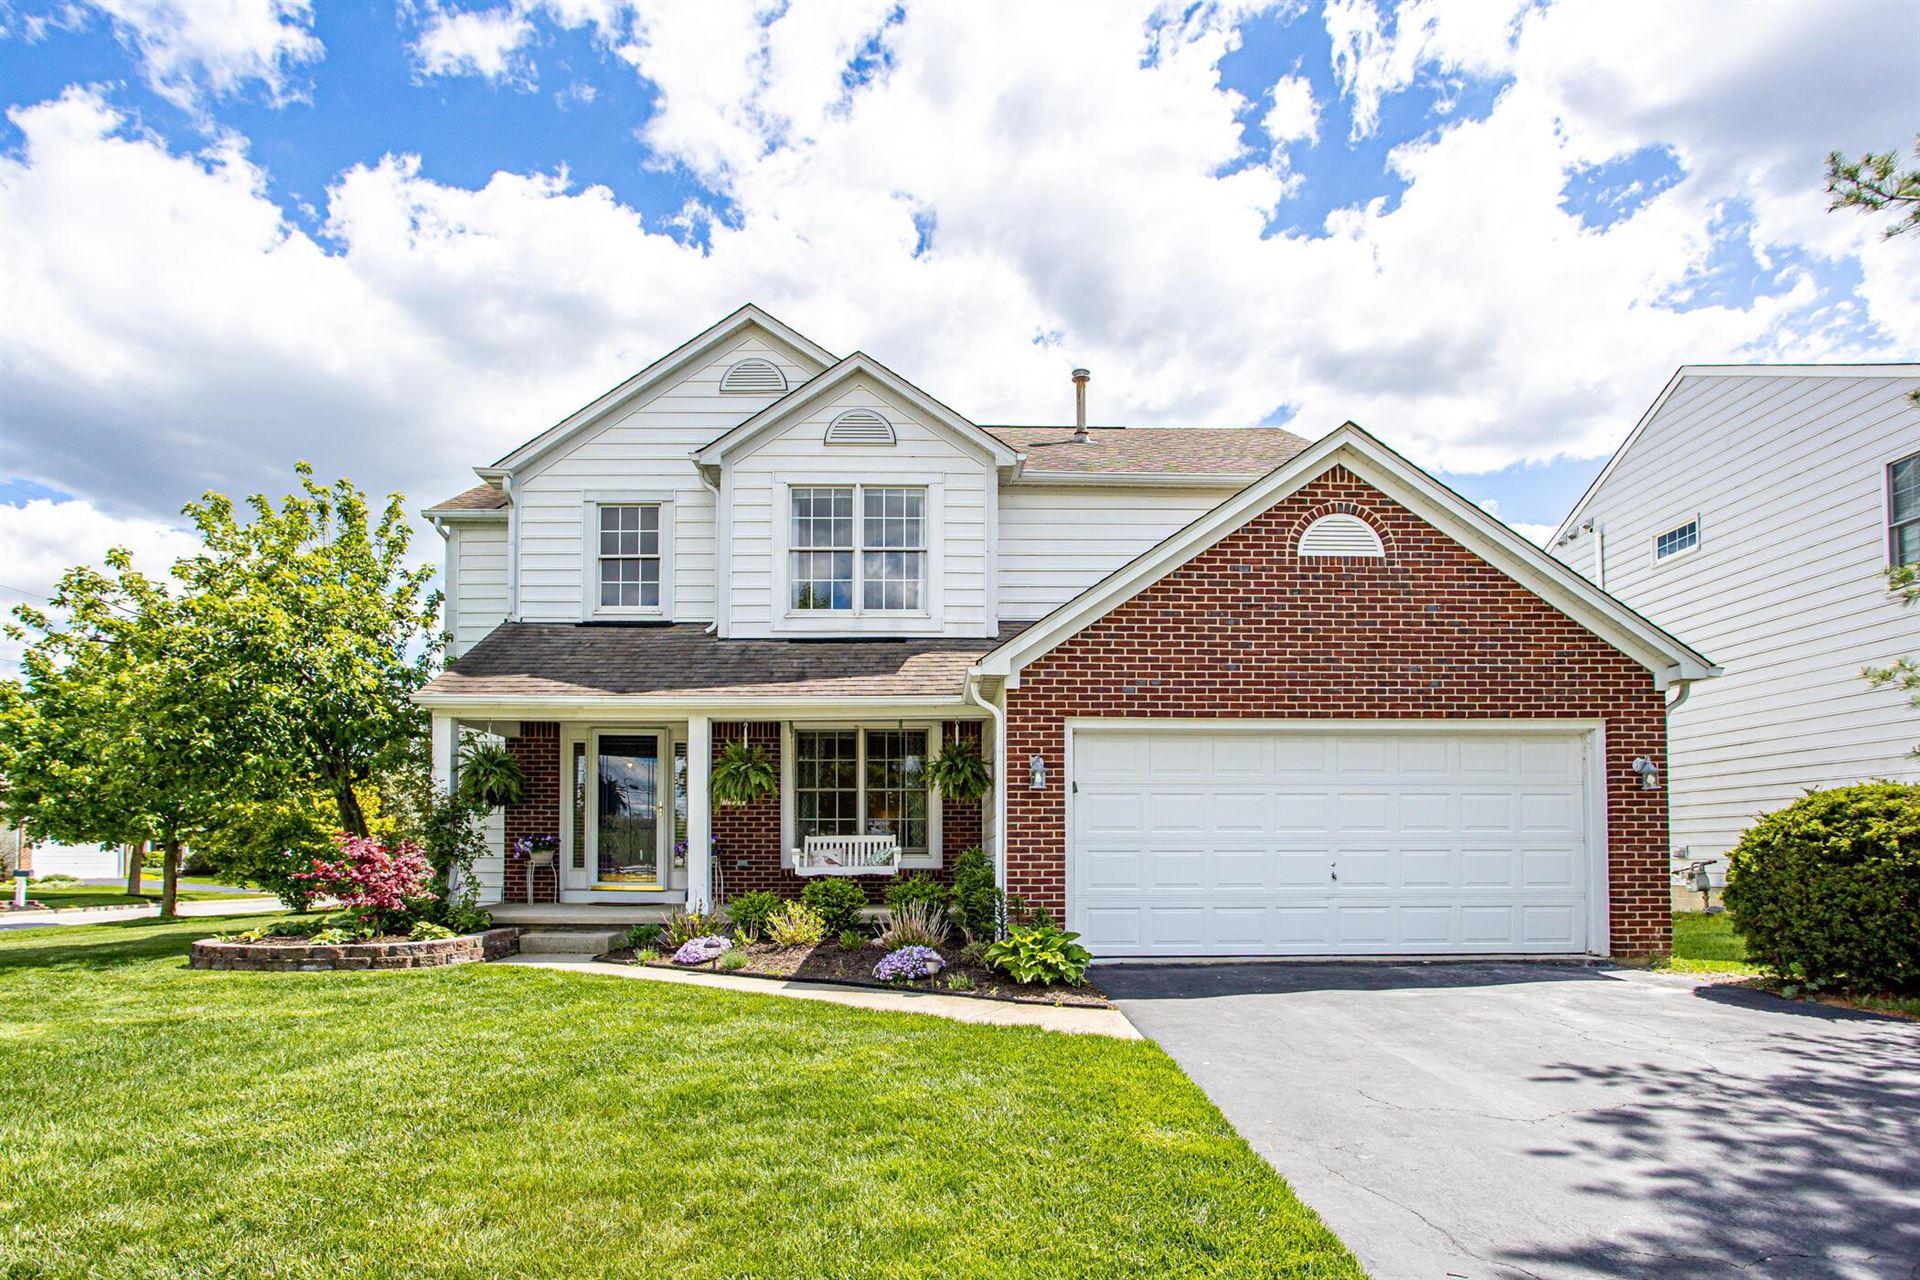 Photo of 4804 Sapwood Drive, New Albany, OH 43054 (MLS # 221014033)